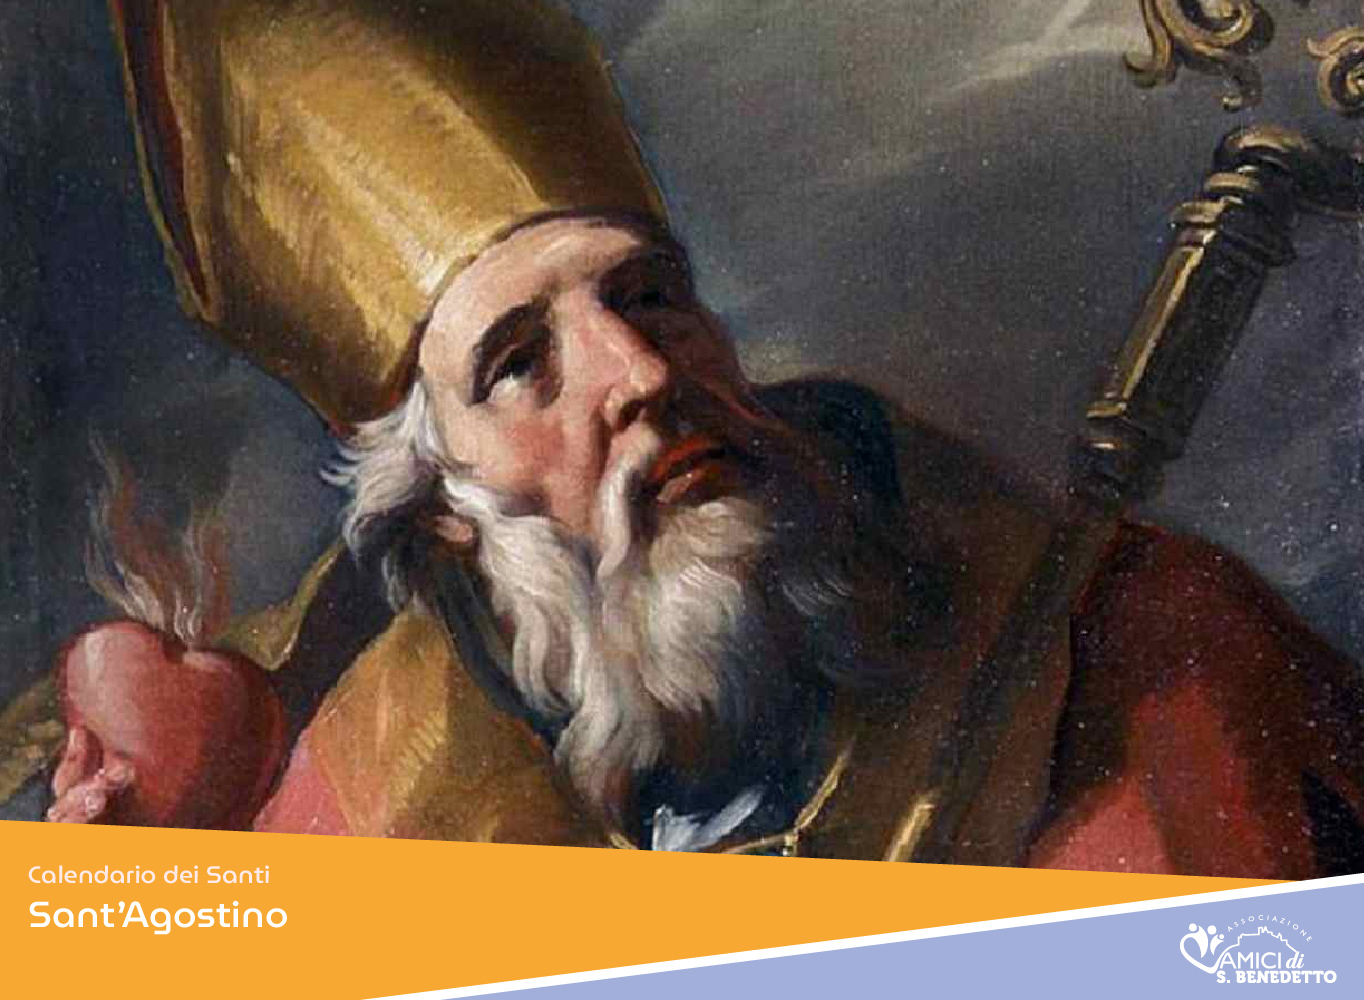 Sant' Agostino